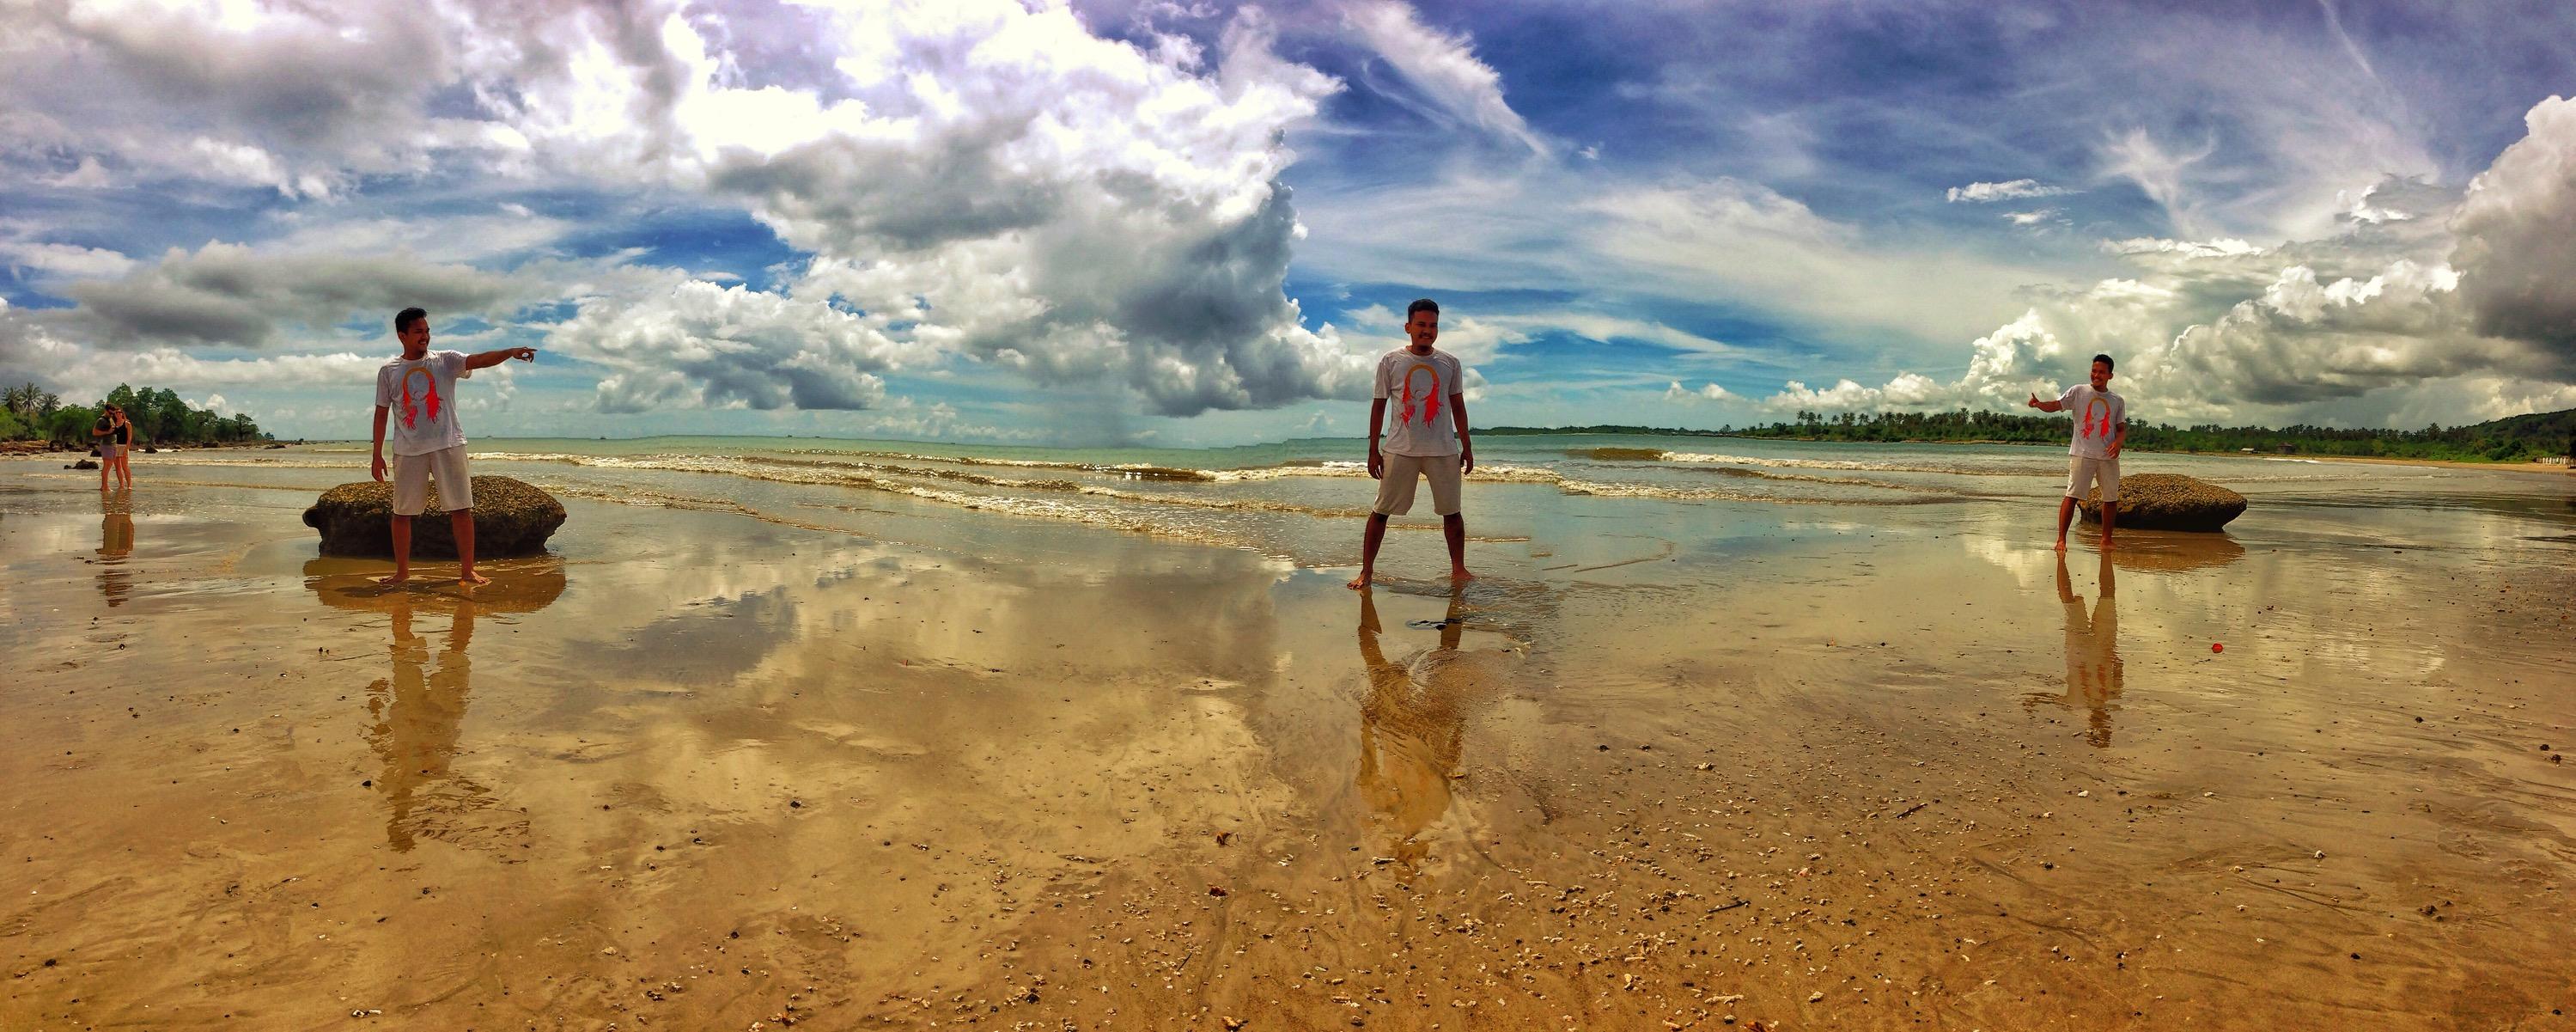 Keindahan Pantai Ciputih Pulau Mangir Ujung Kulon Beck Kab Pandeglang